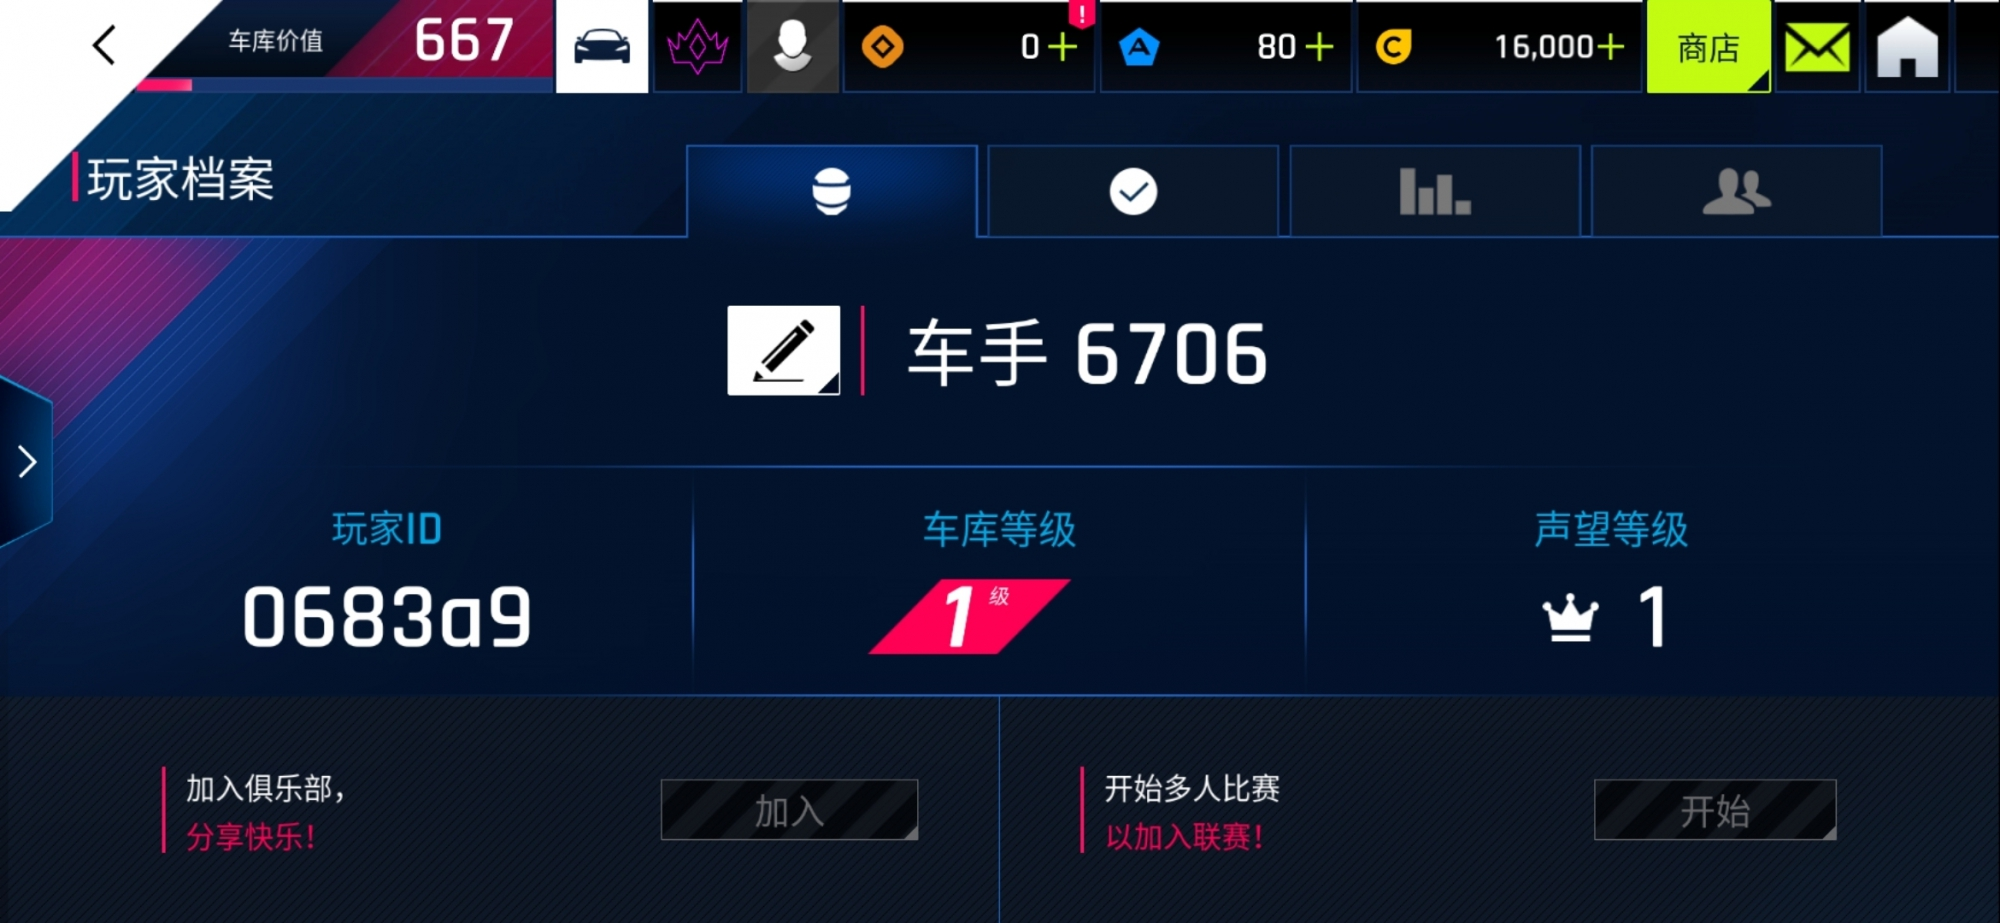 Screenshot_20190818_155602_com.aligames.kuang.kybc.huawei.jpg